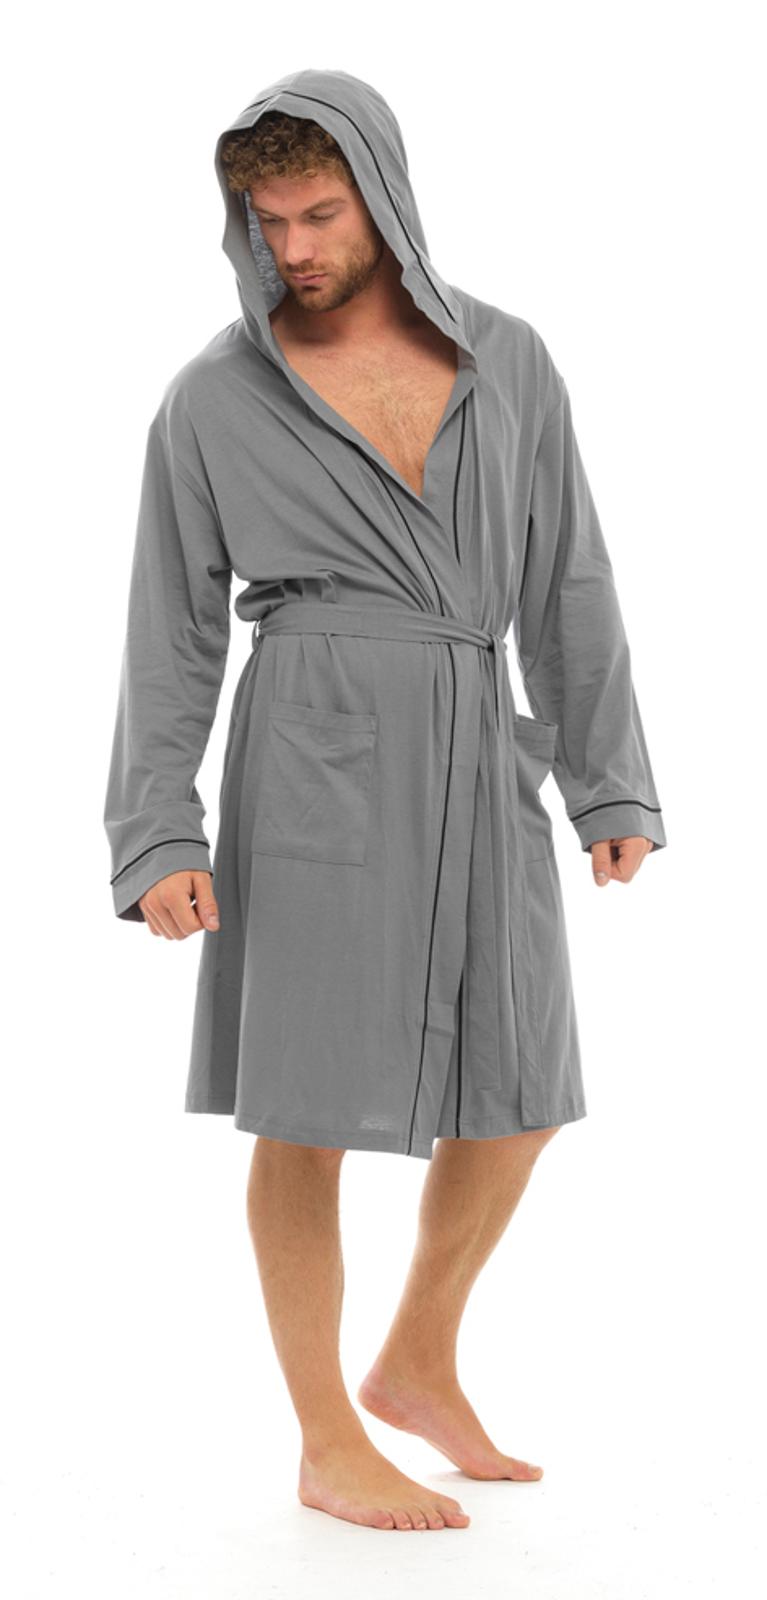 Mens Lightweight Hooded Robe Summer Dressing Gown 100